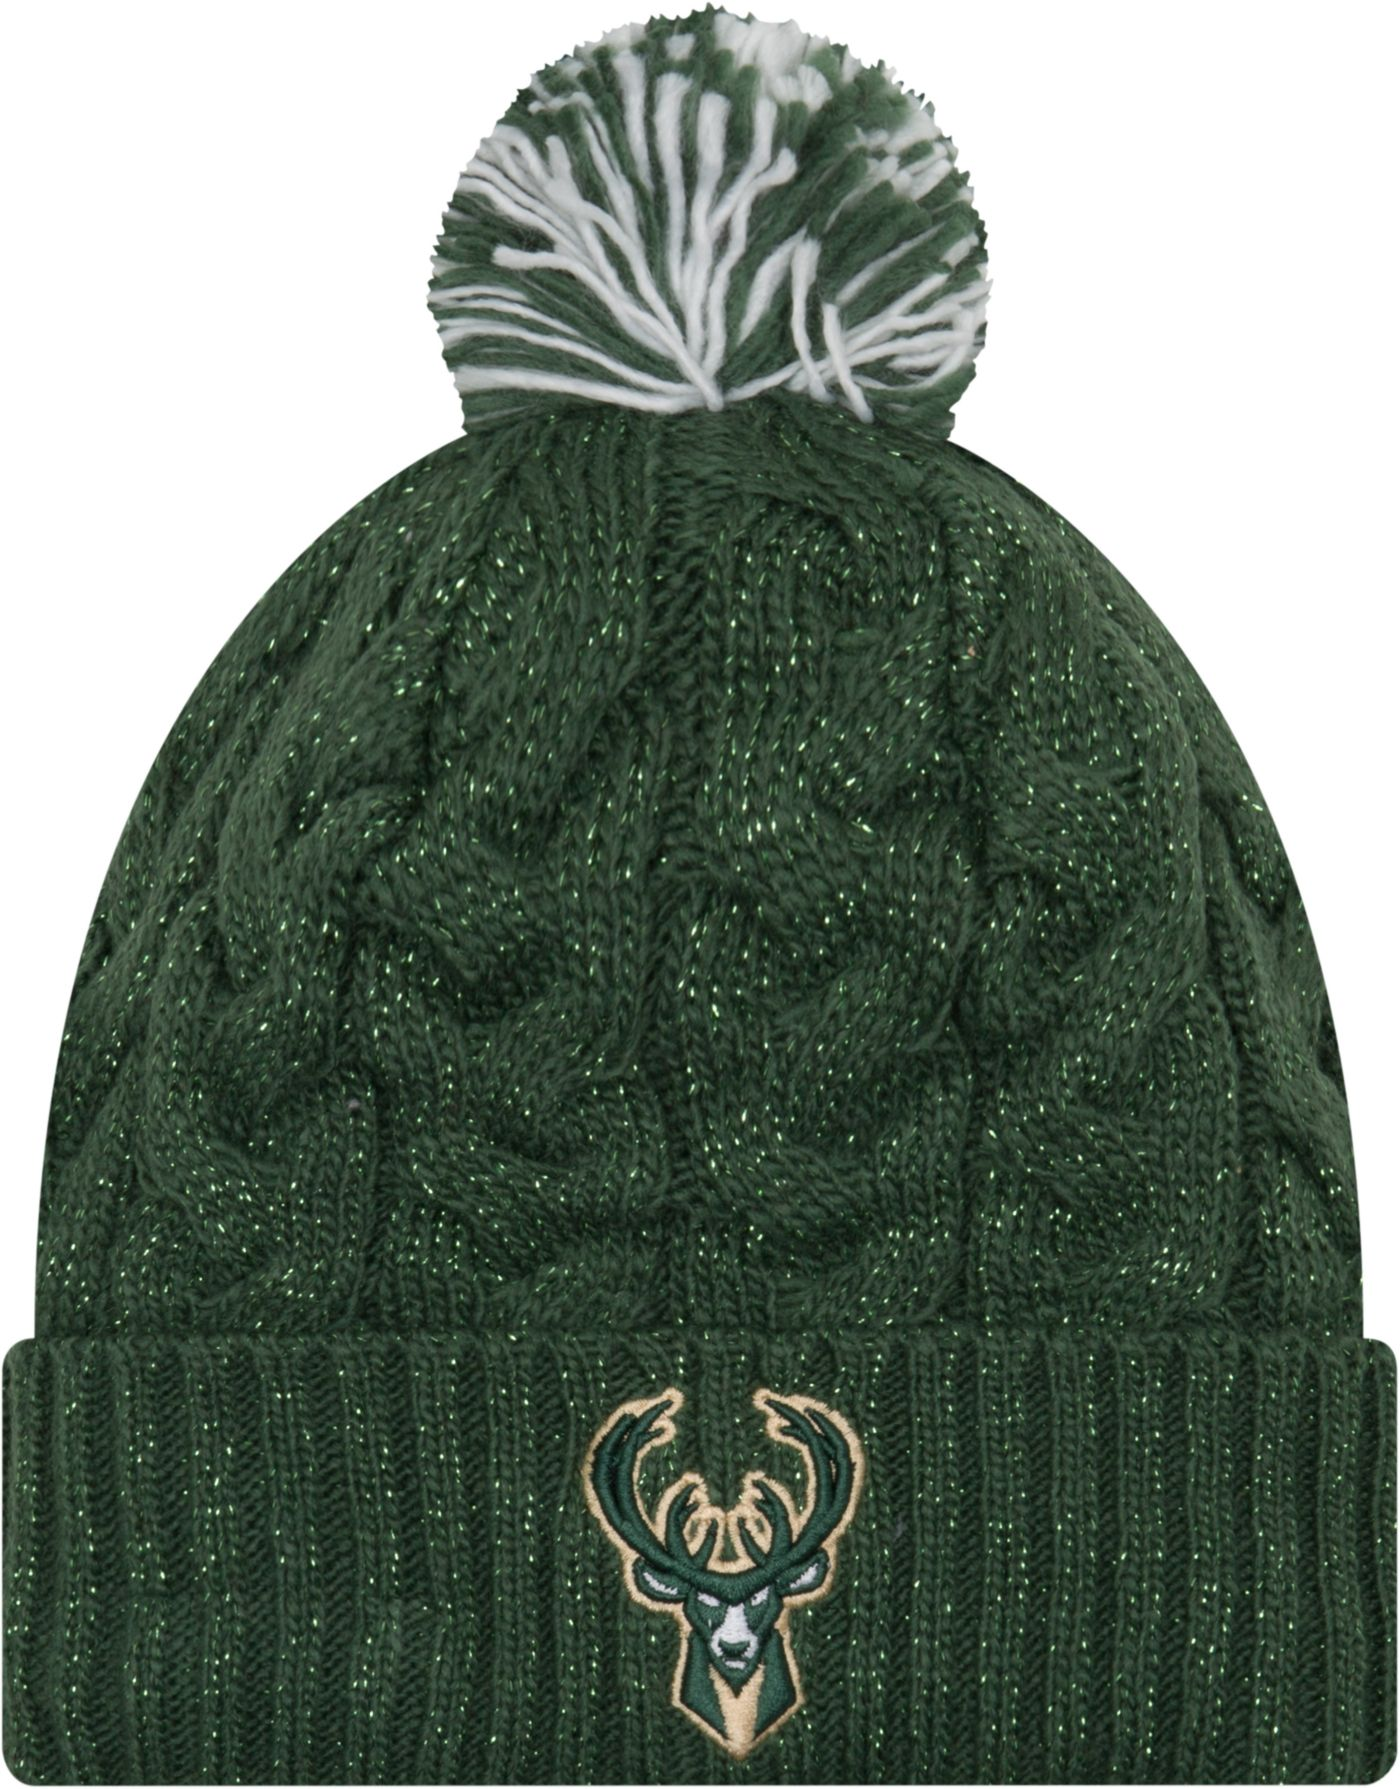 New Era Women's Milwaukee Bucks Cozy Knit Hat